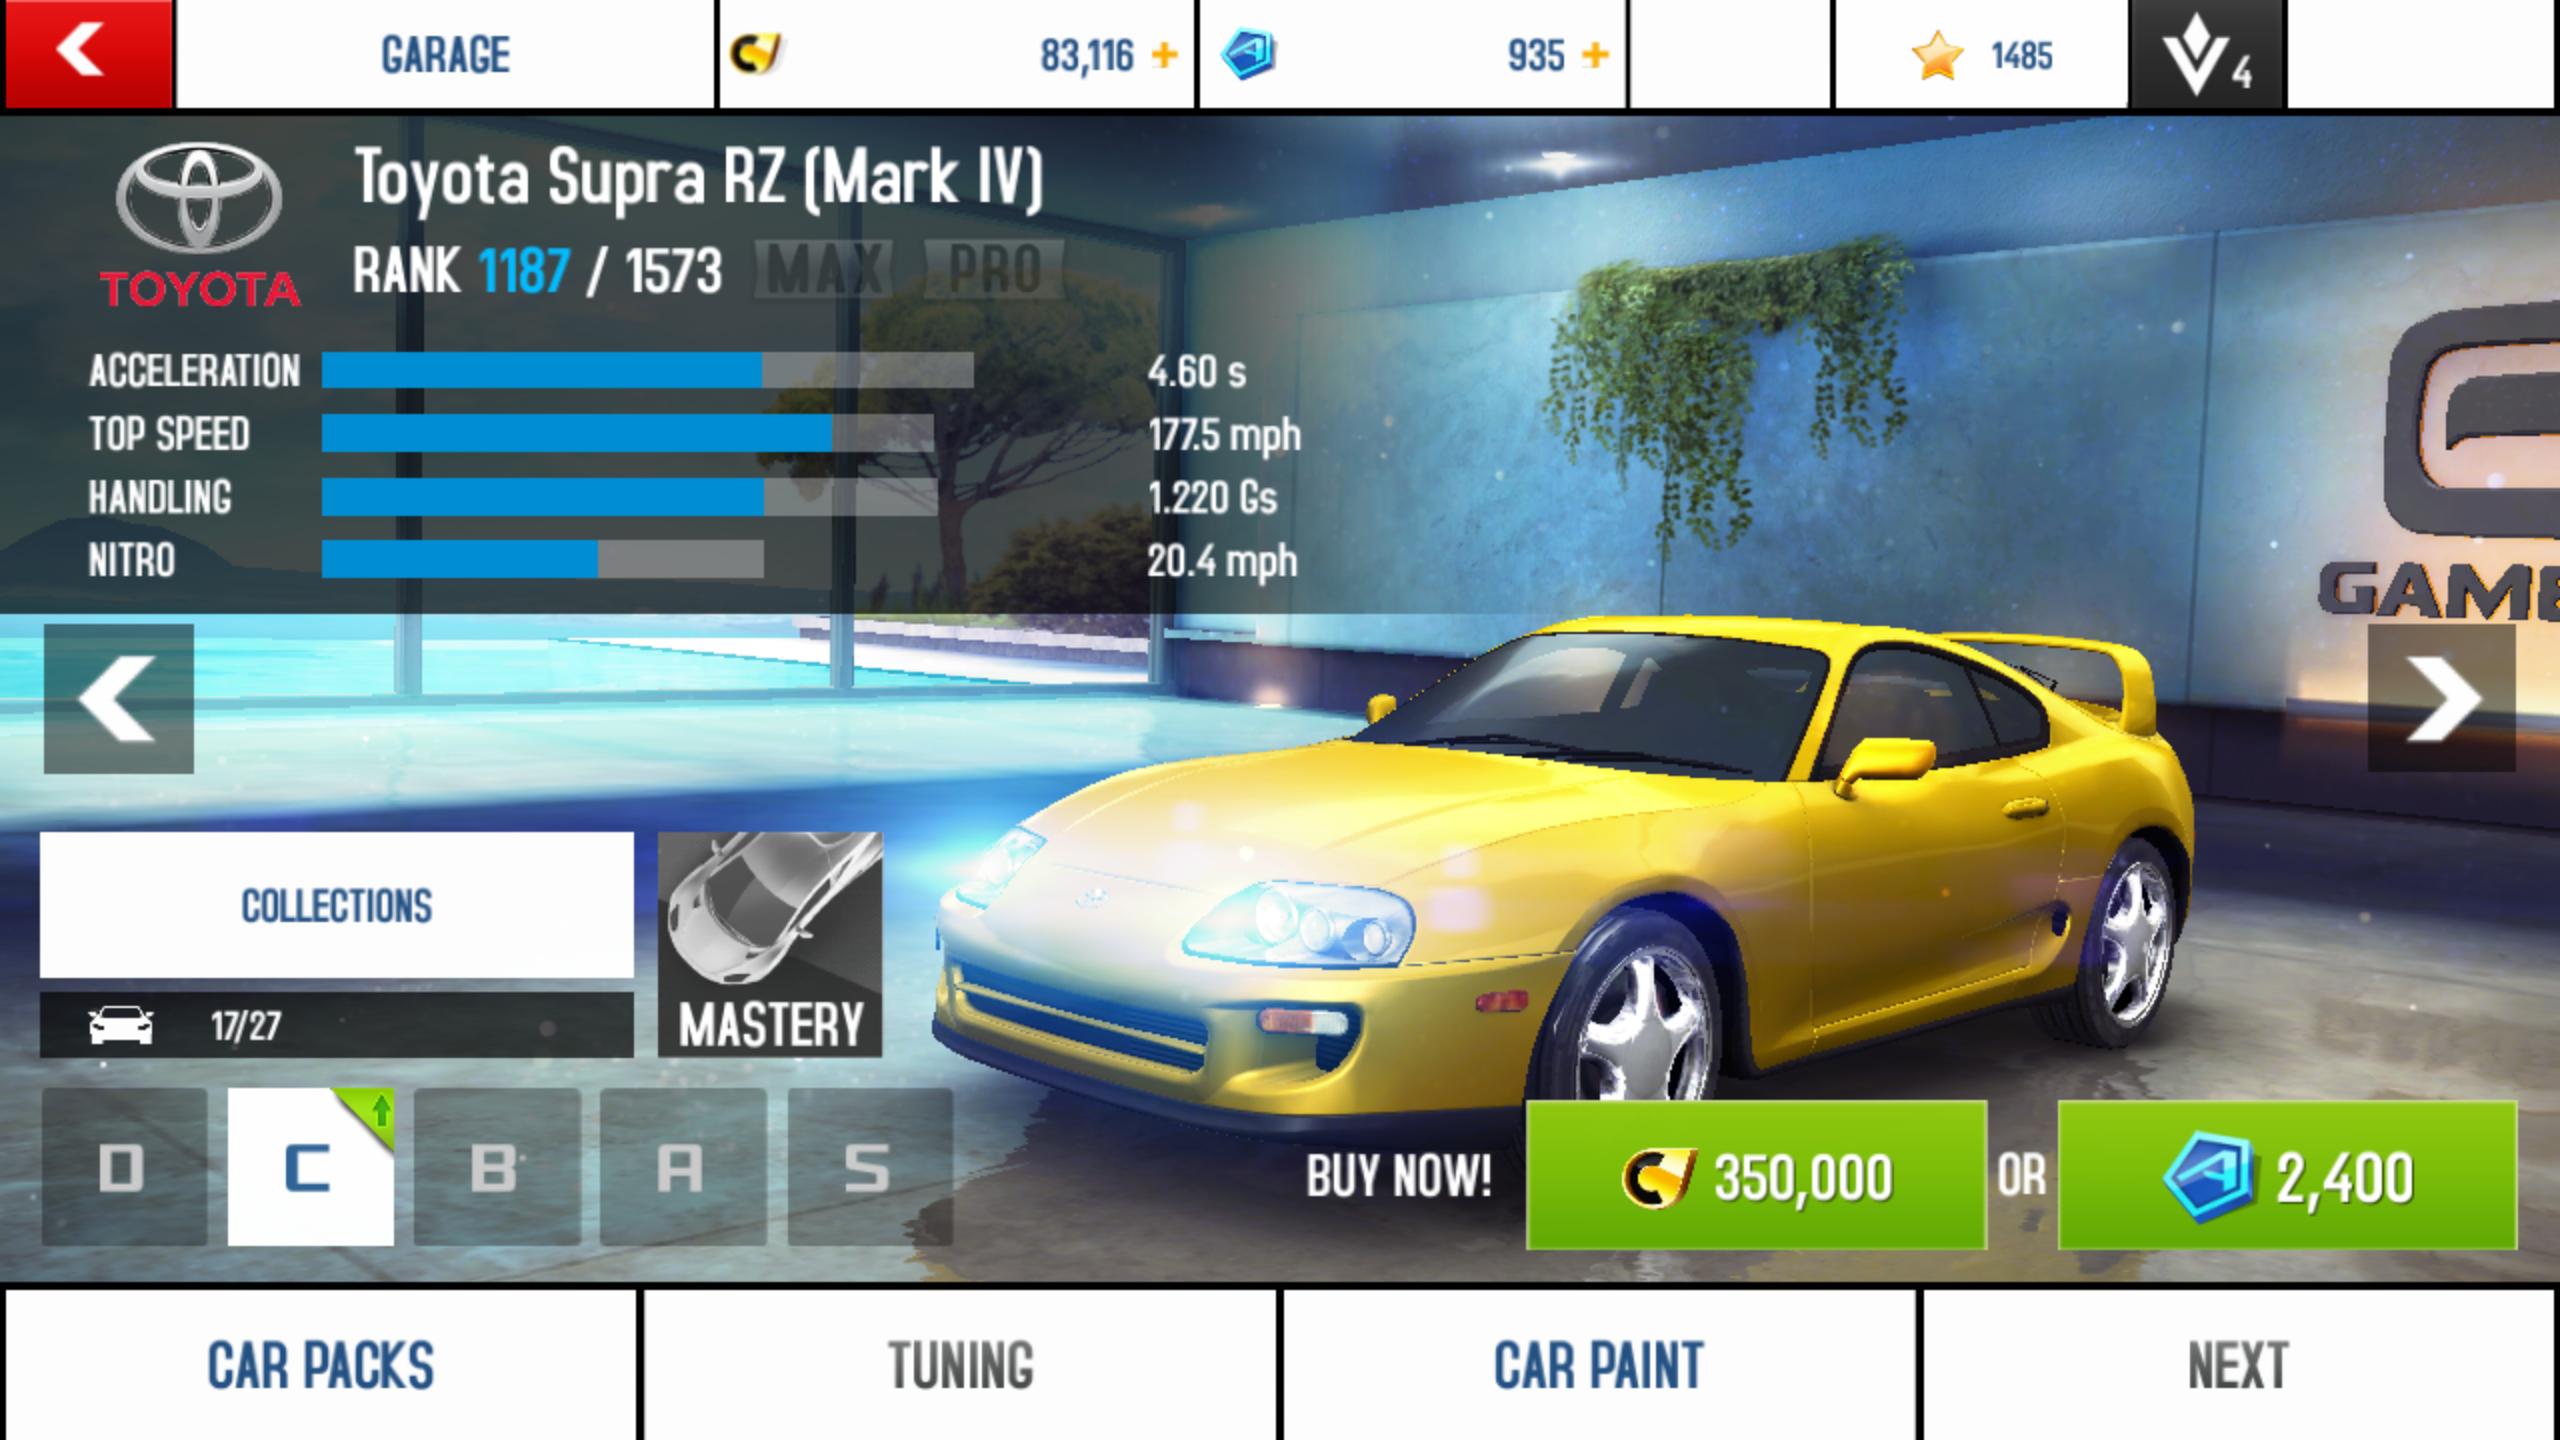 Toyota Supra RZ (Mark IV)